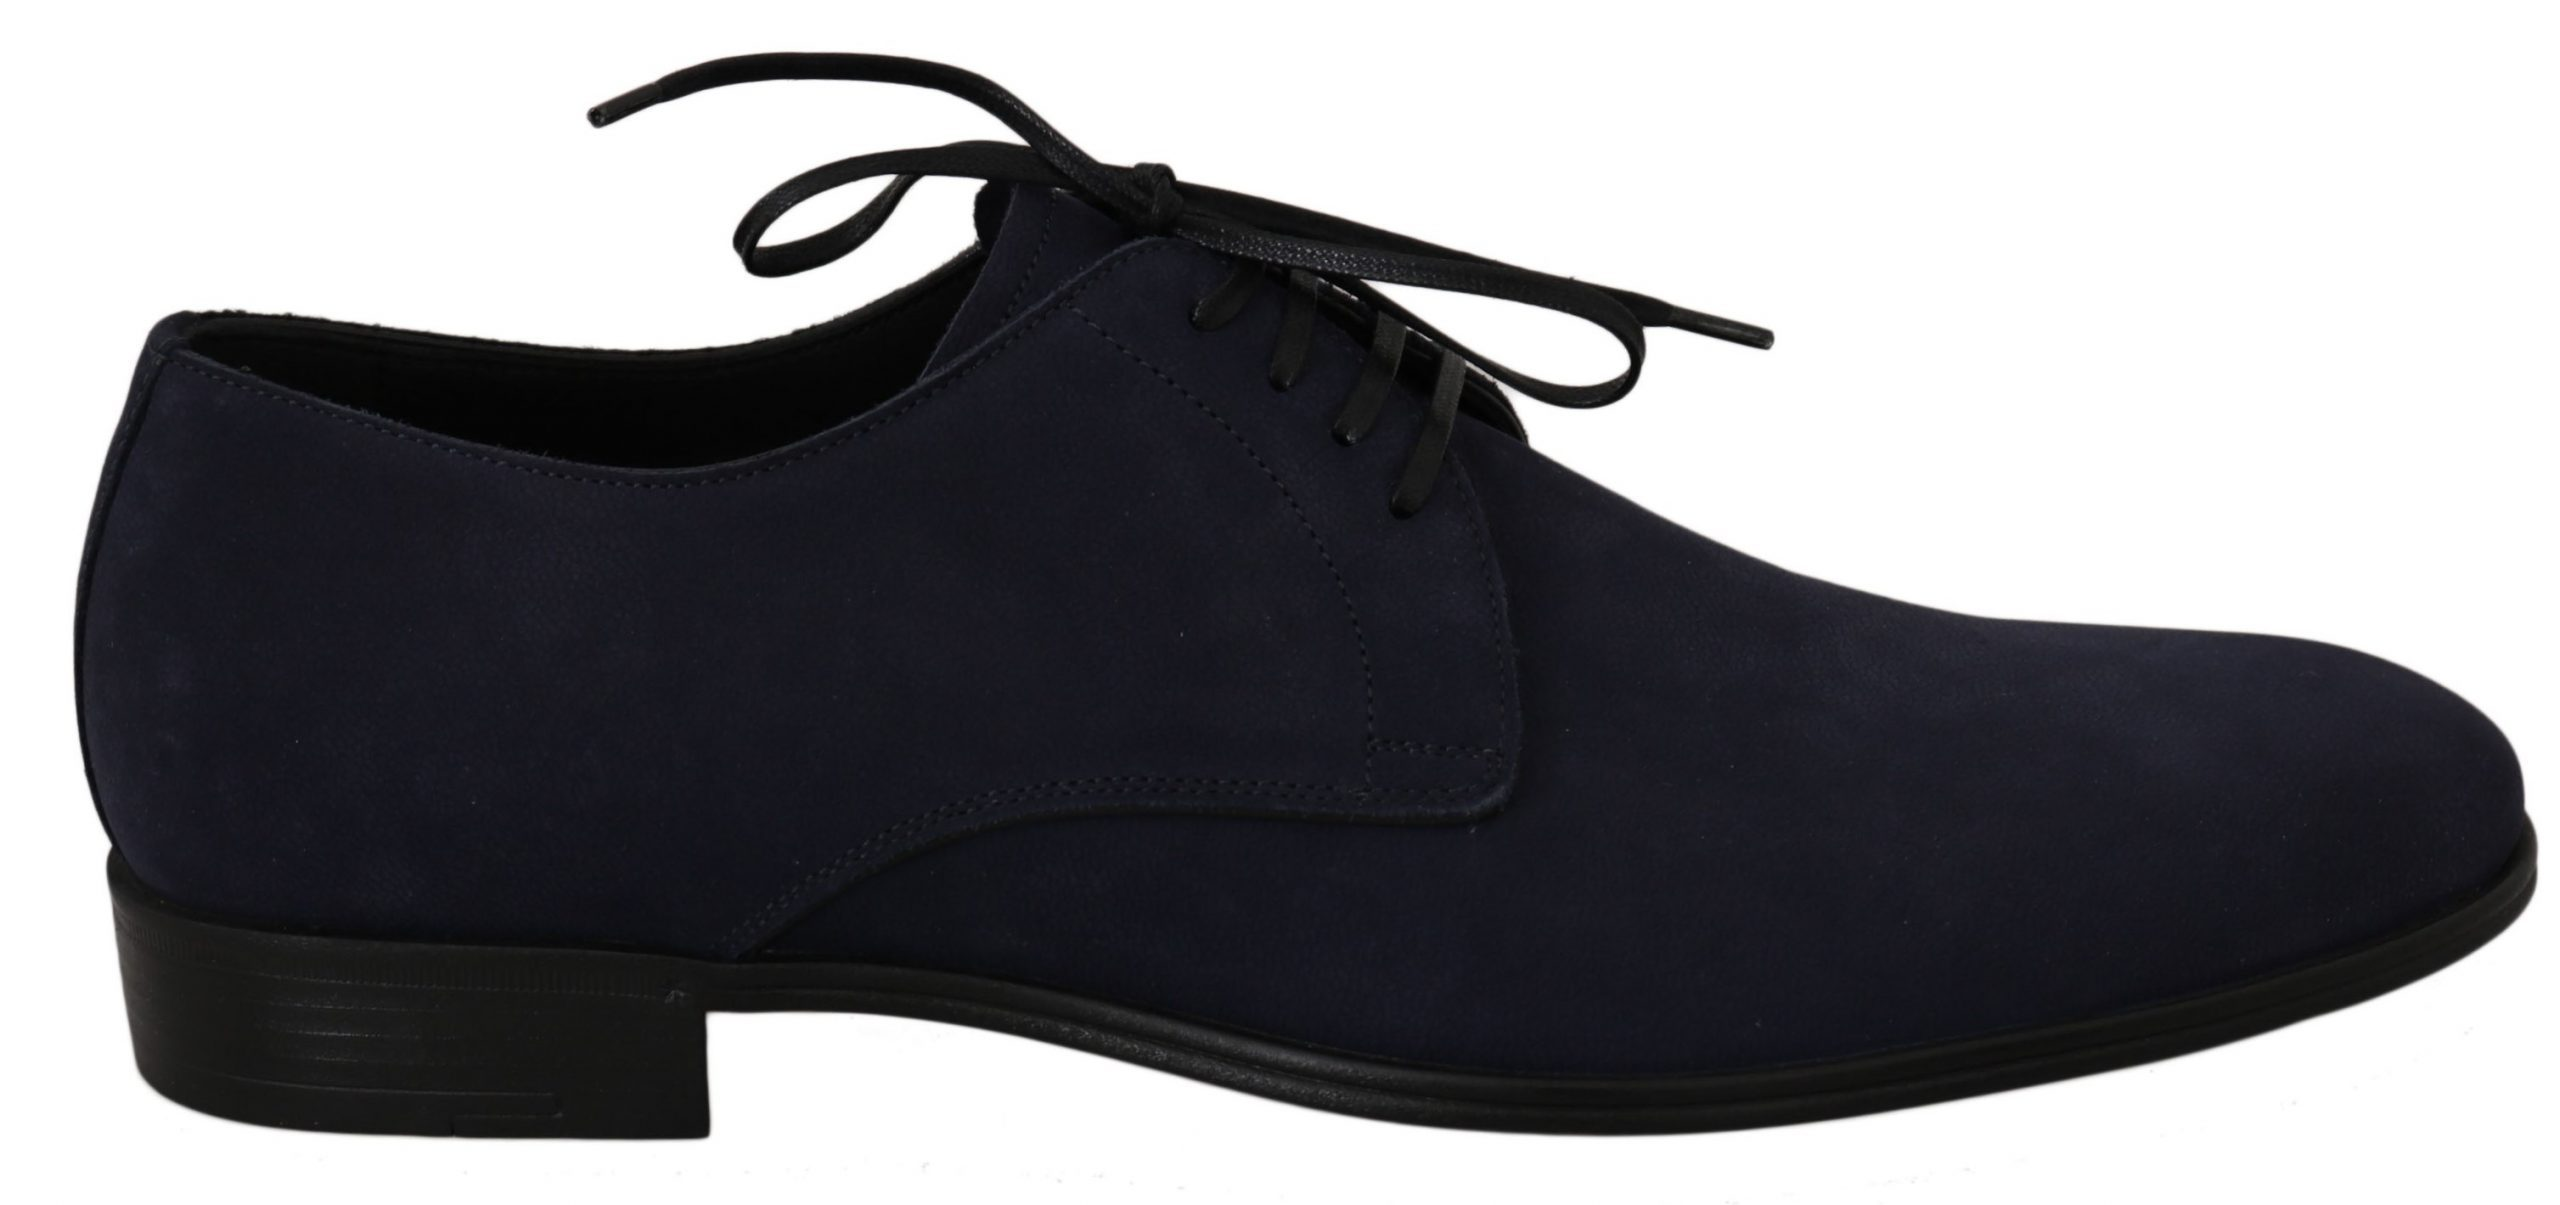 Dolce & Gabbana Men's Shoes Blue MV2346 - EU40/US7